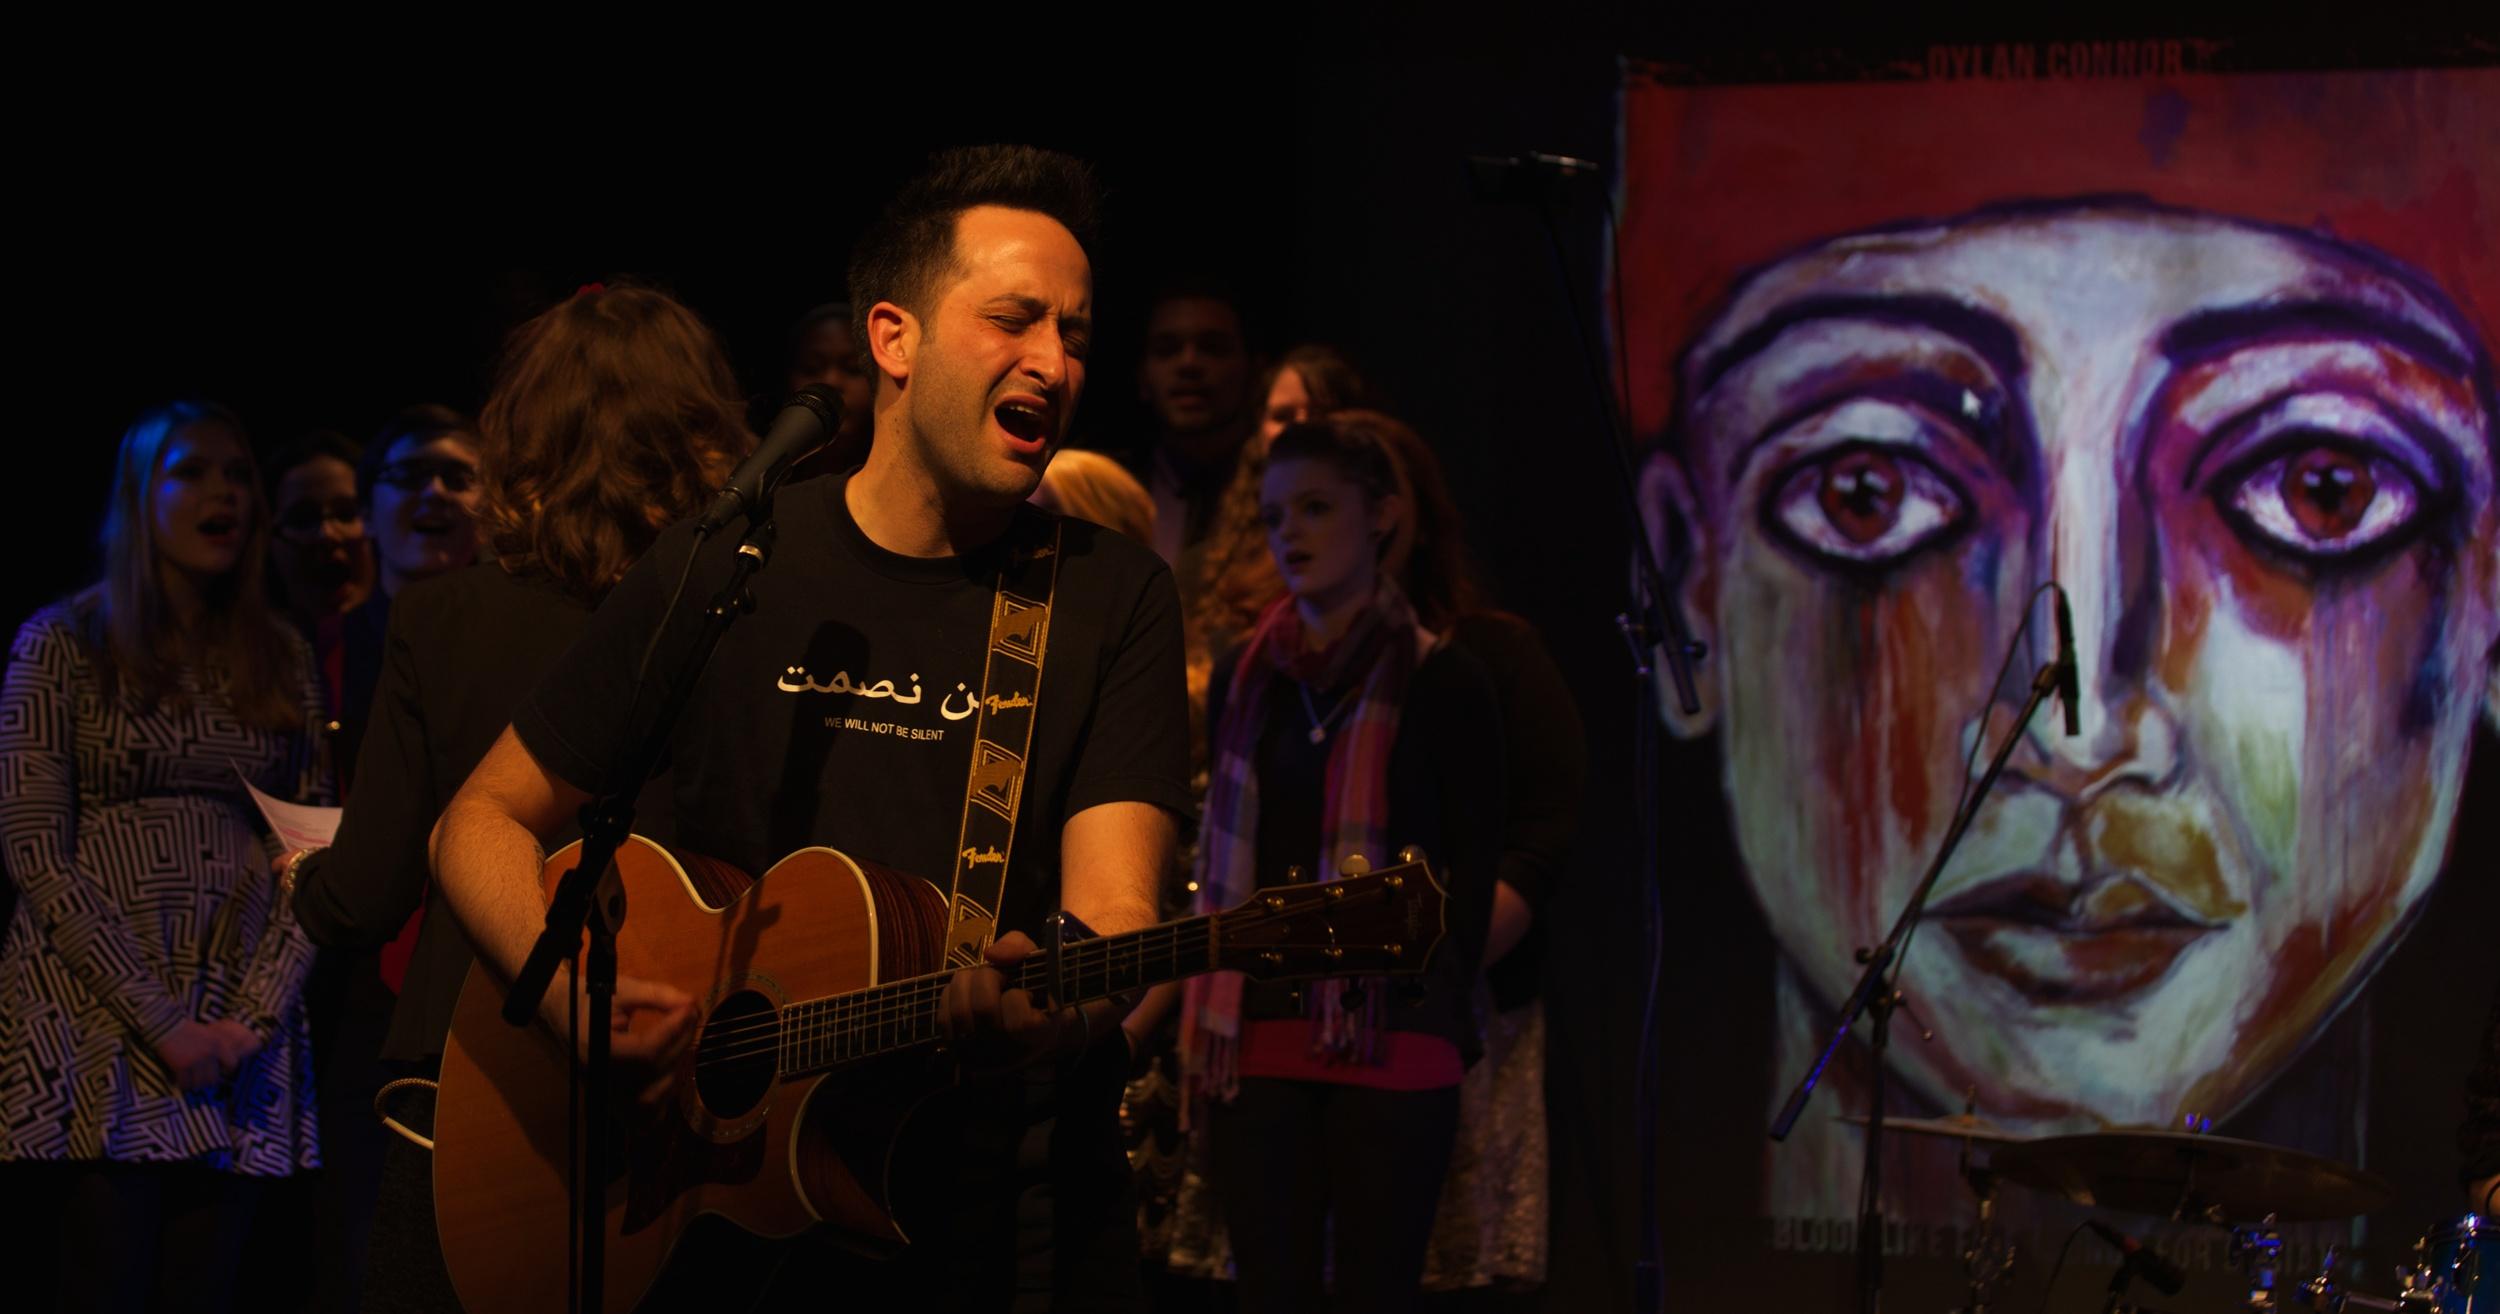 Syria Concert_2014-01-17_21-32-27_©Sal Mollica2014.jpg